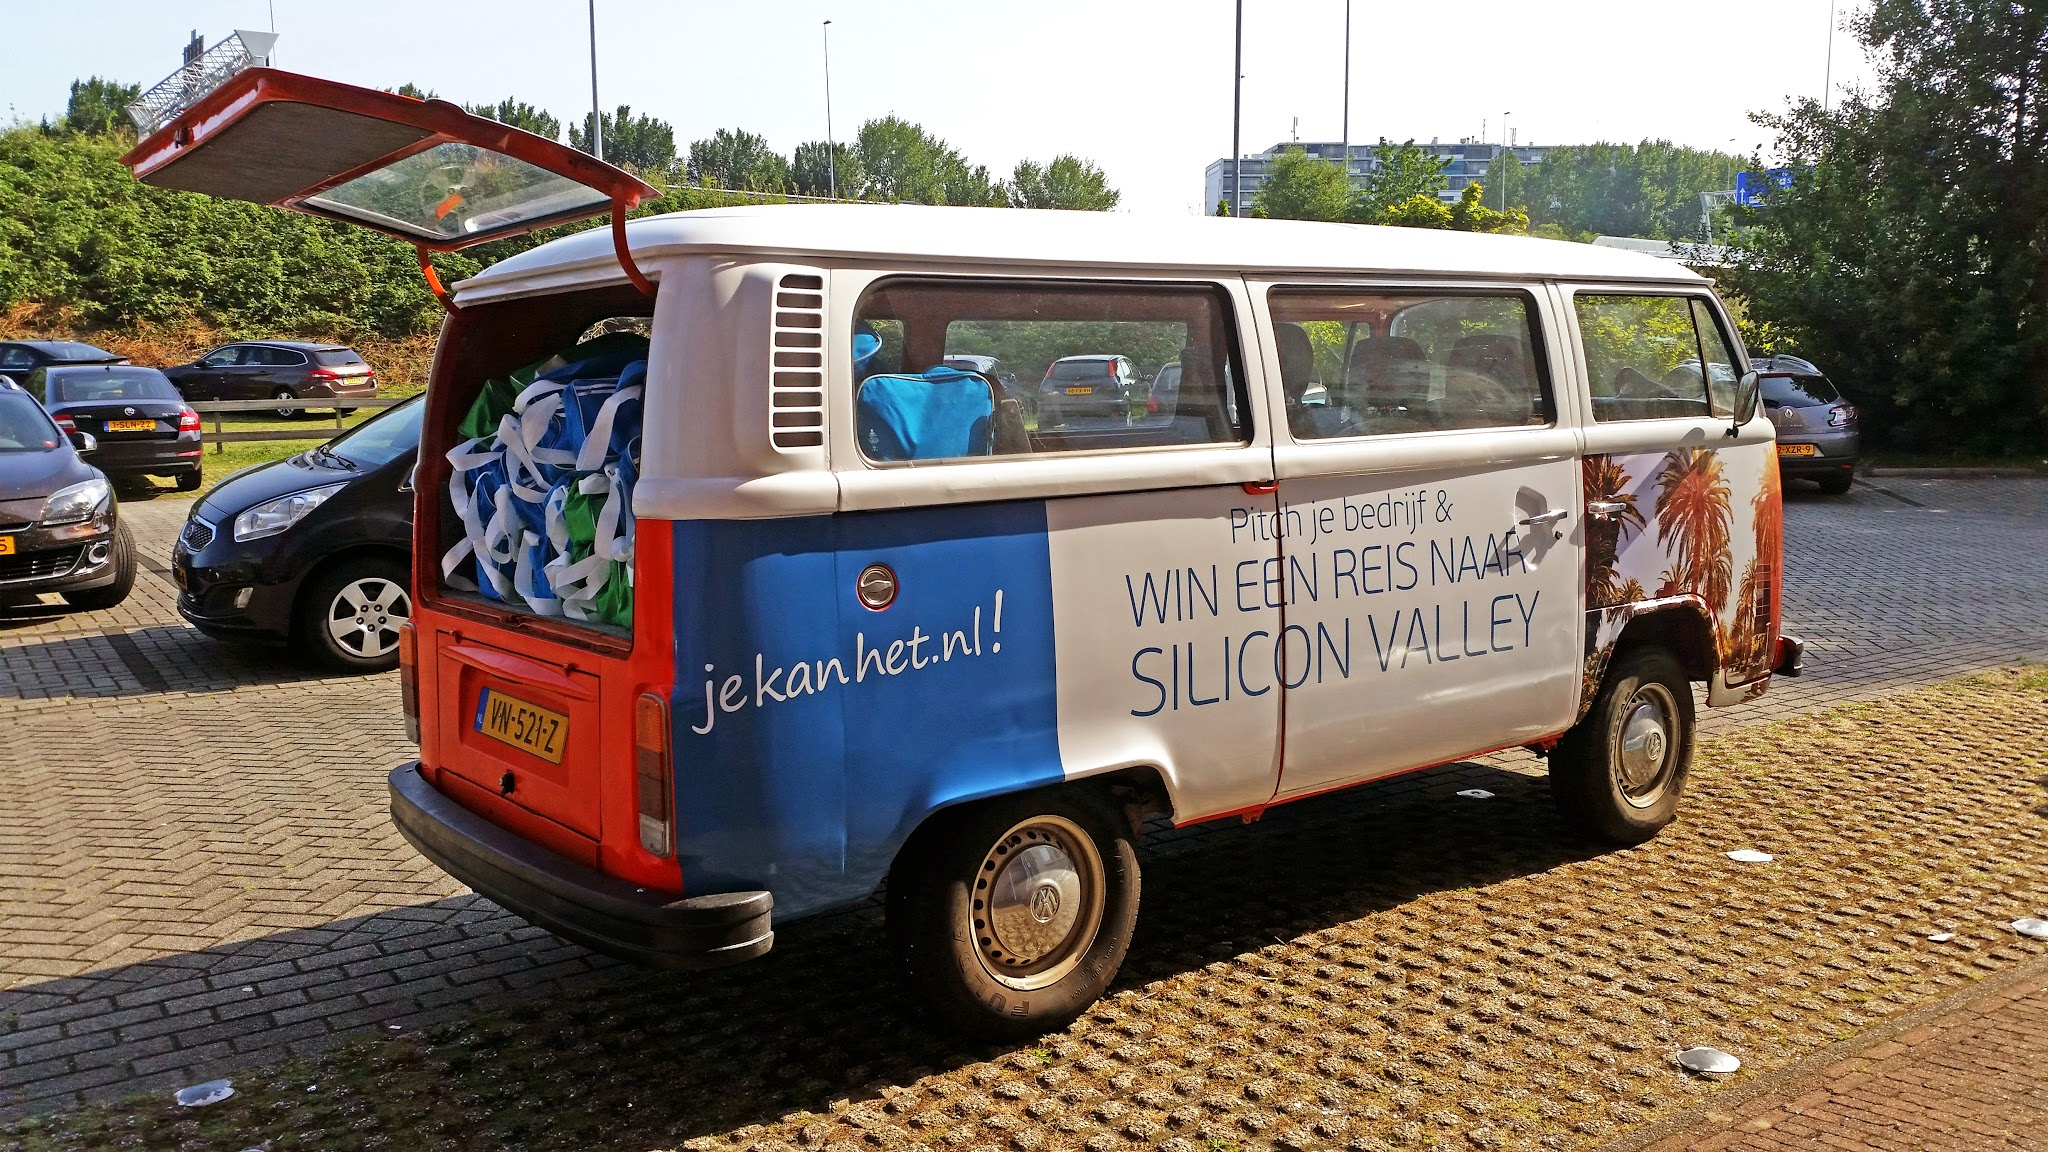 Ontwerp bestickering VW-busje campagne 'Pitch je bedrijf' voor Visma e-Accounting. Door: www.zuurstof.nl